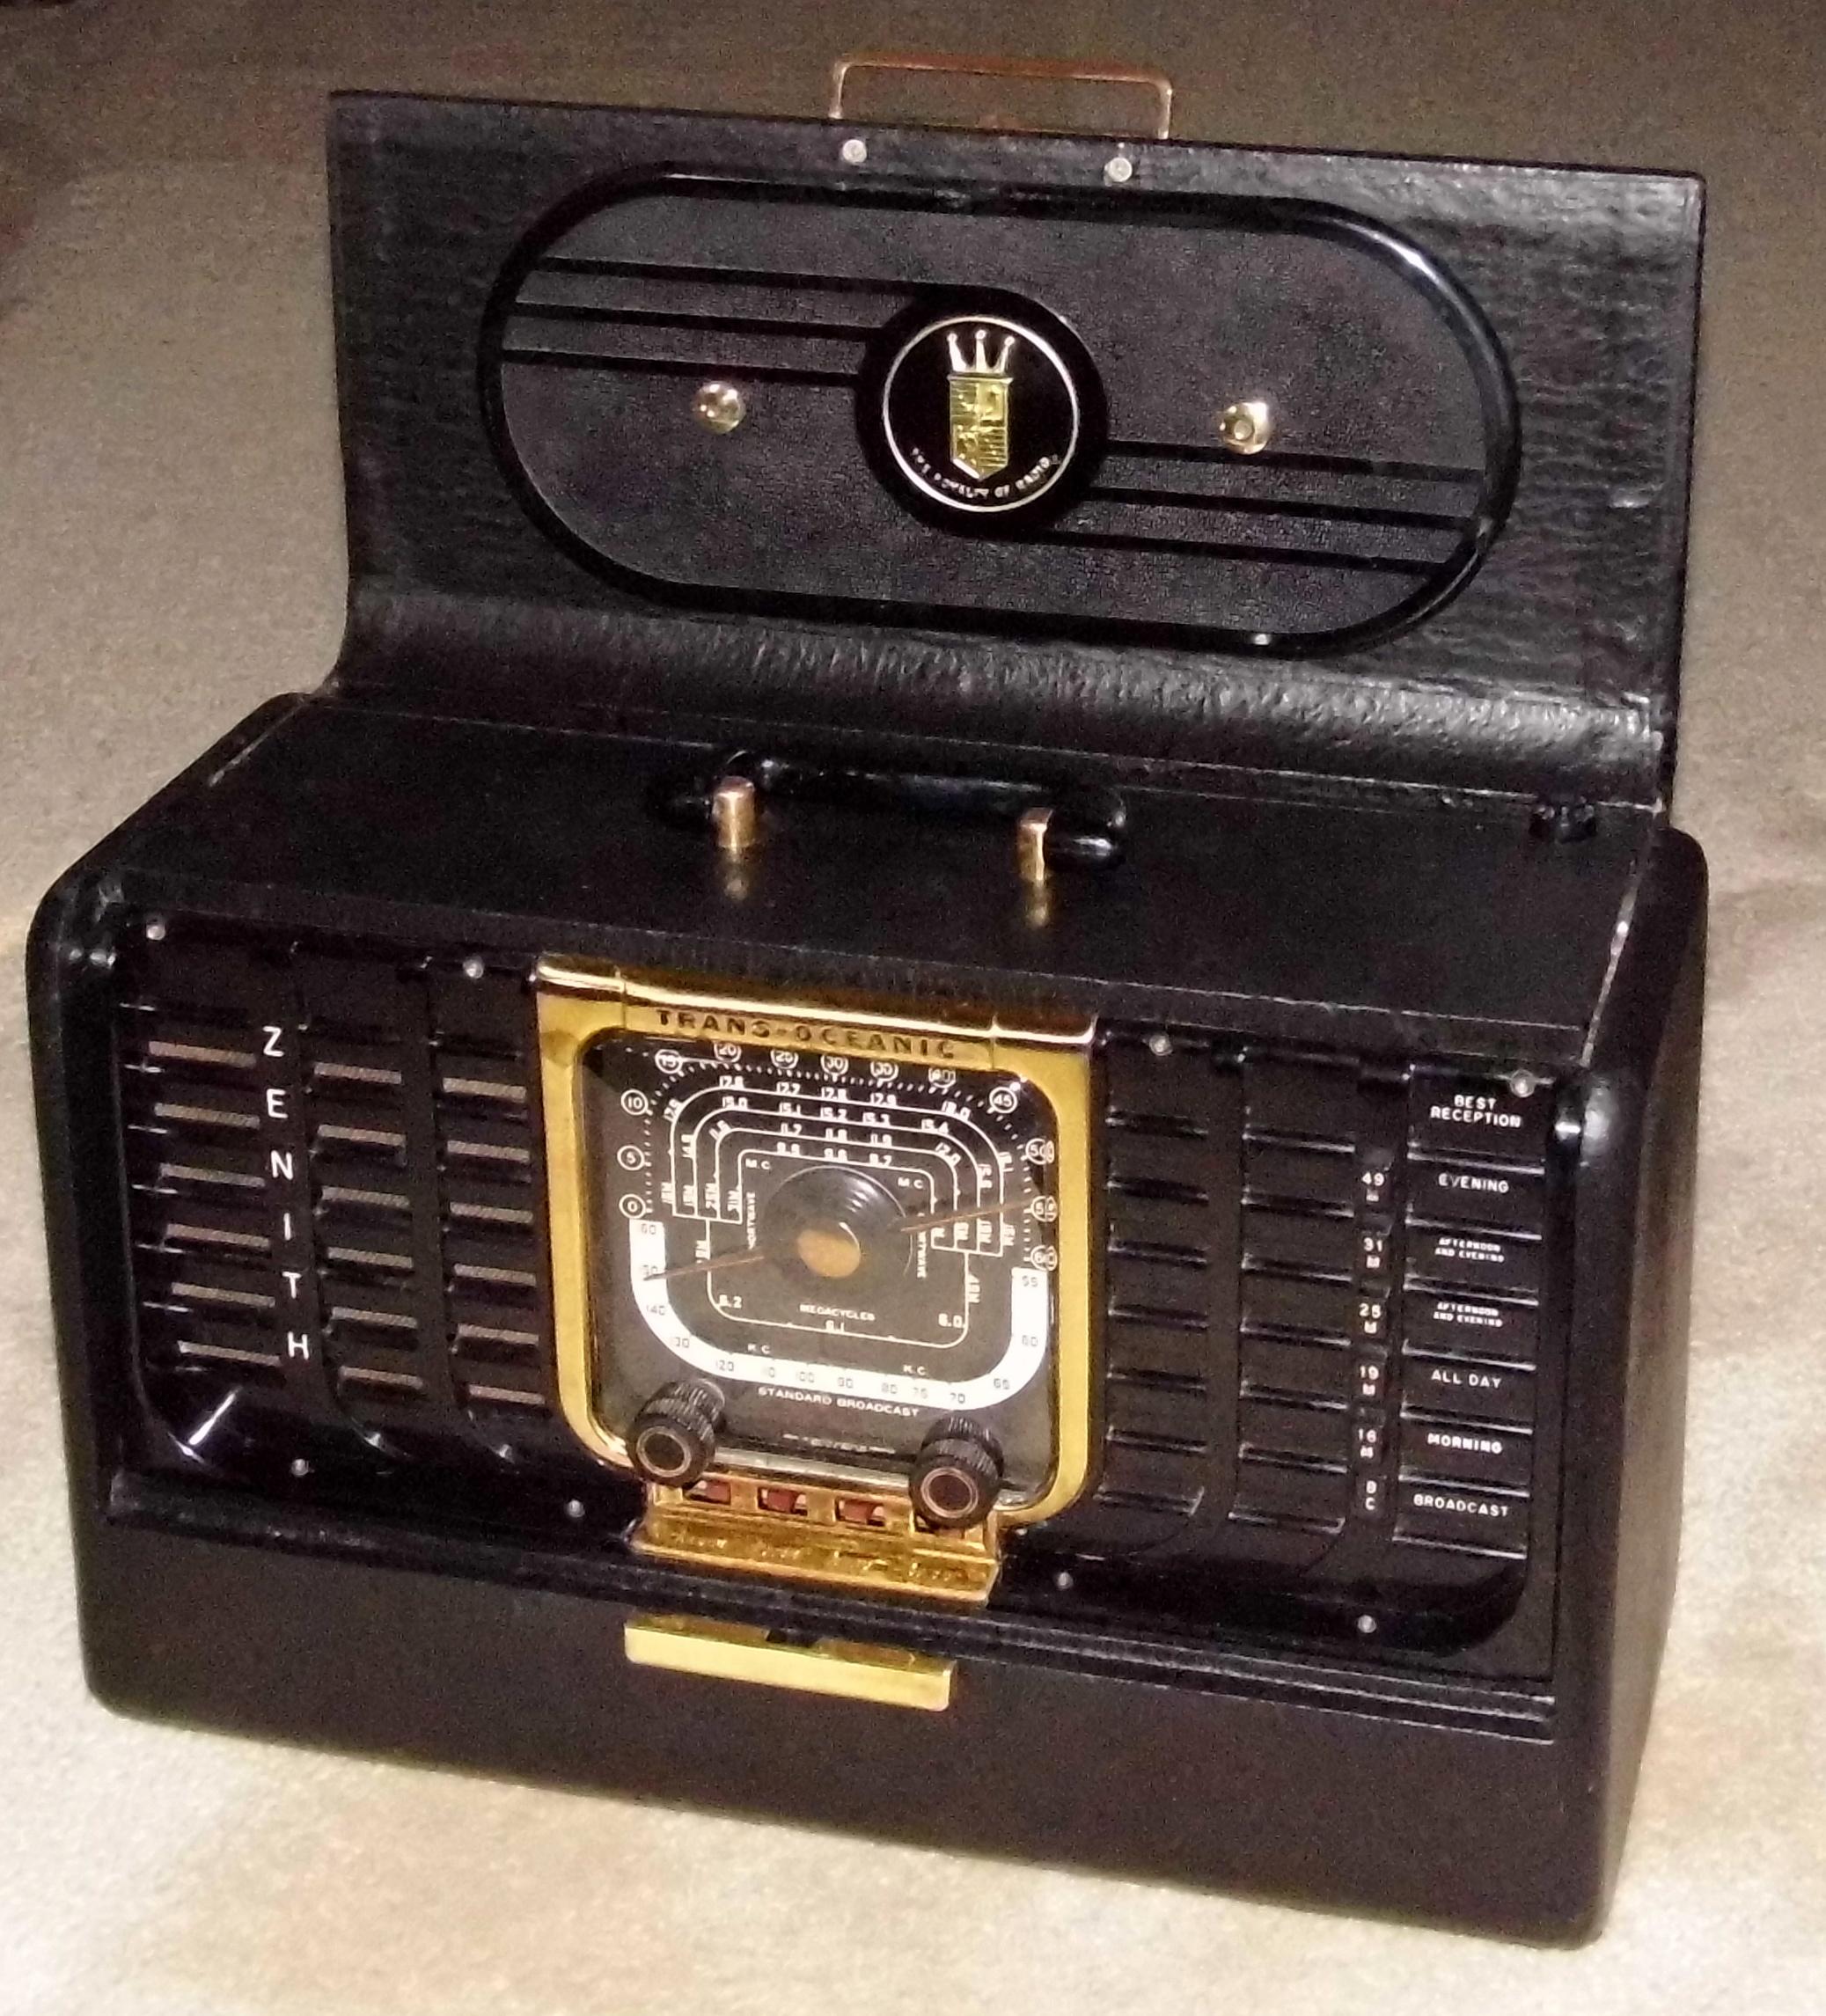 By zenith radio year models Radio Attic's